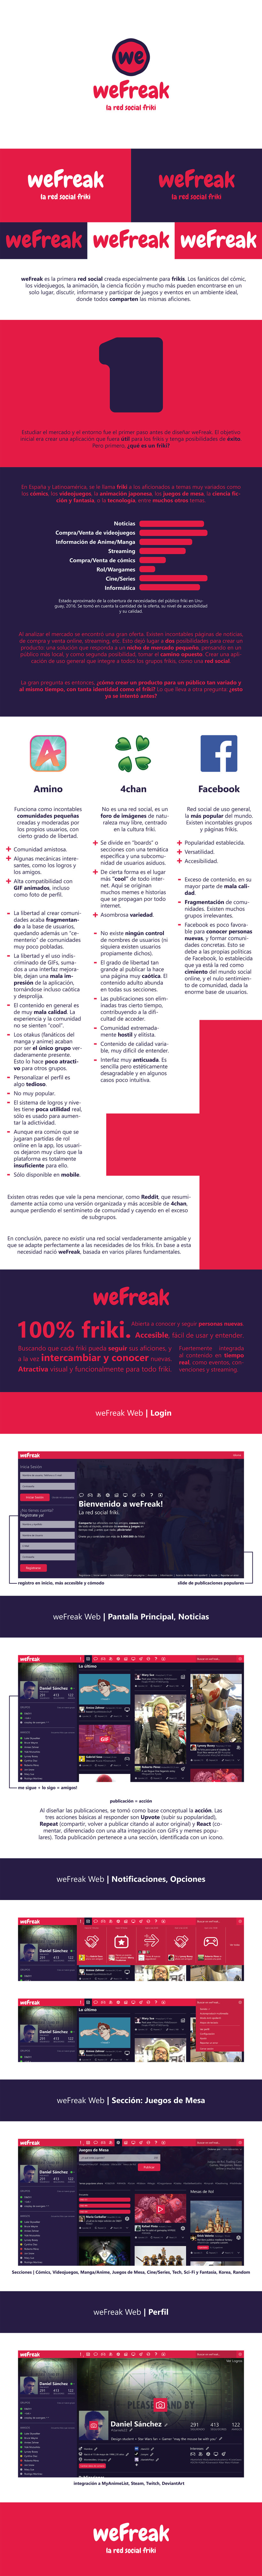 weFreak 0